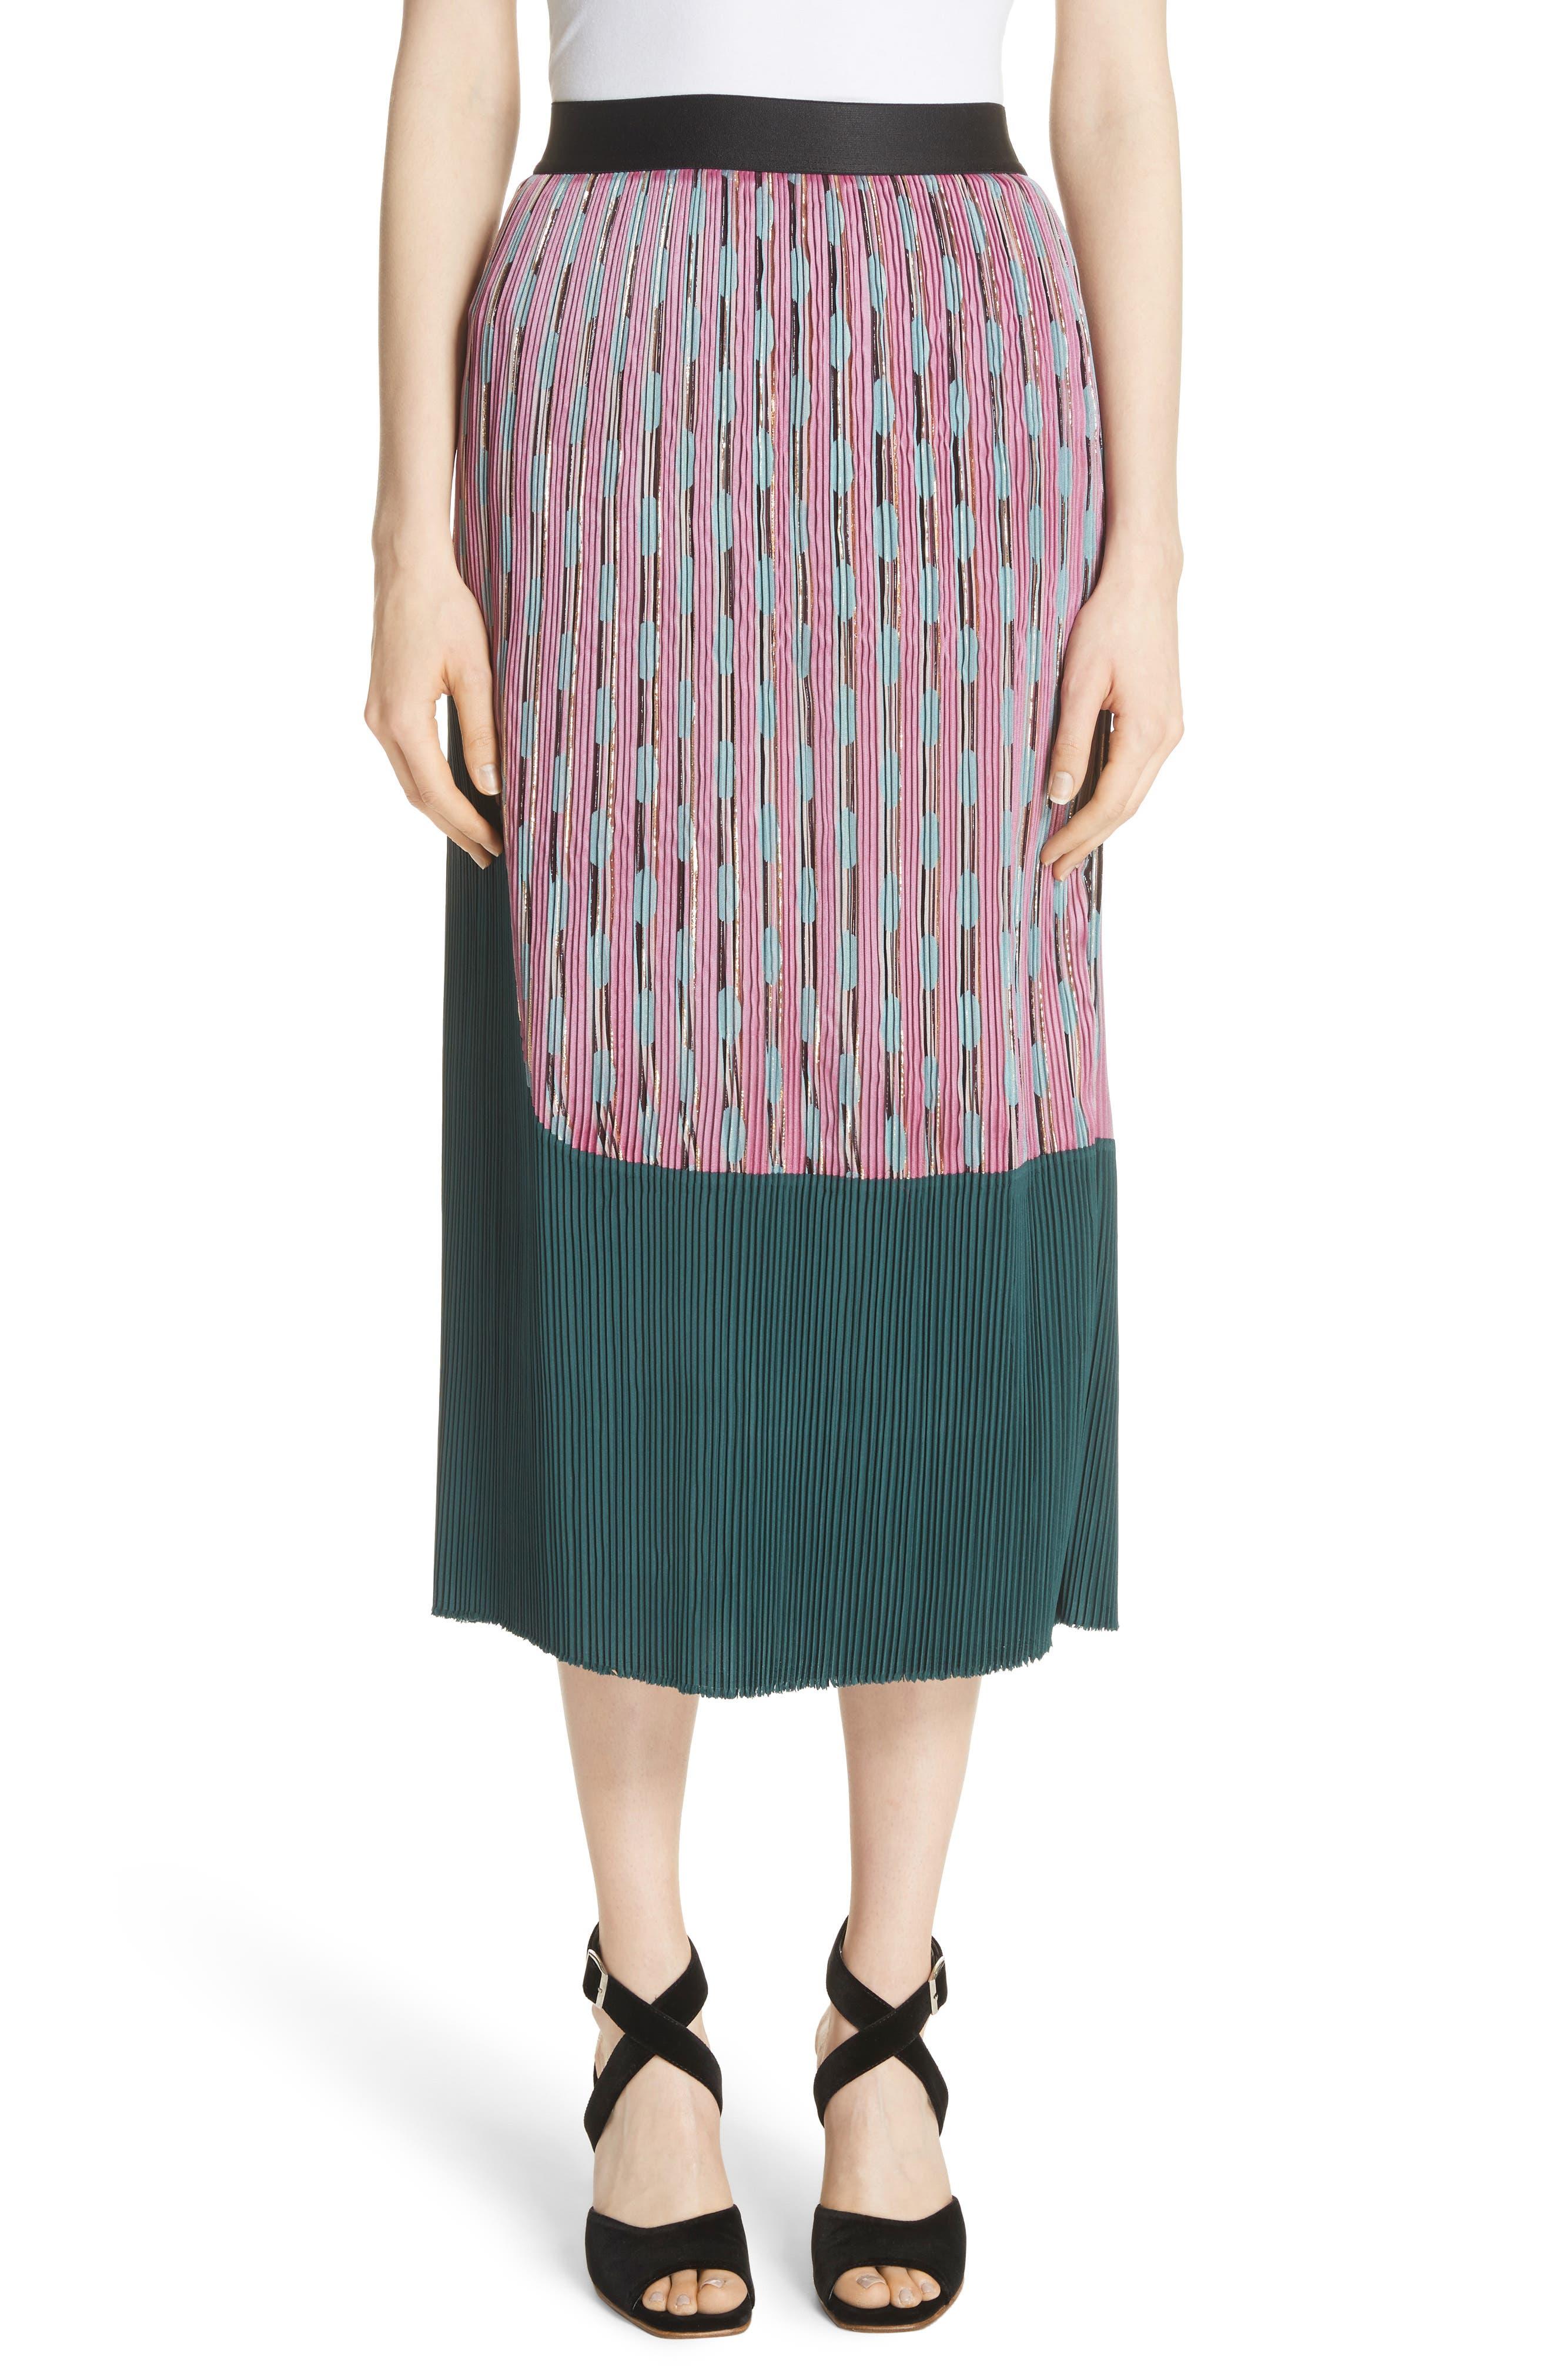 Alternate Image 1 Selected - Rachel Comey Ballista Midi Skirt